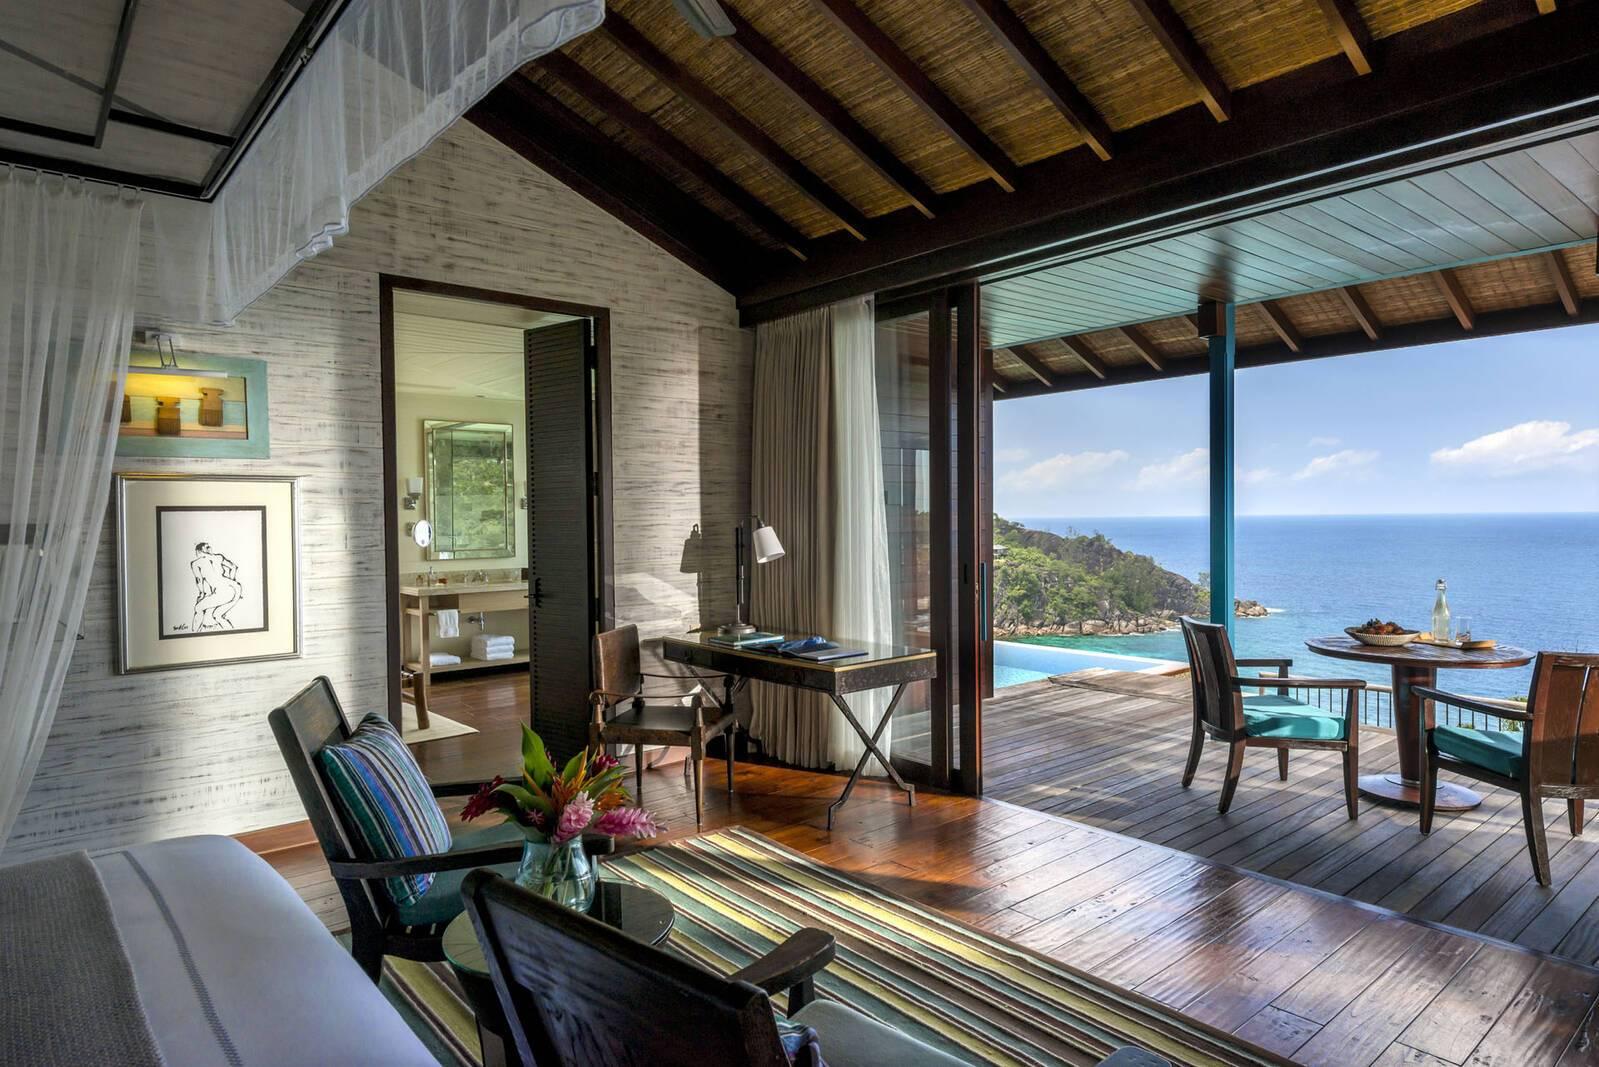 Four Seasons Seychelles VillaJPG